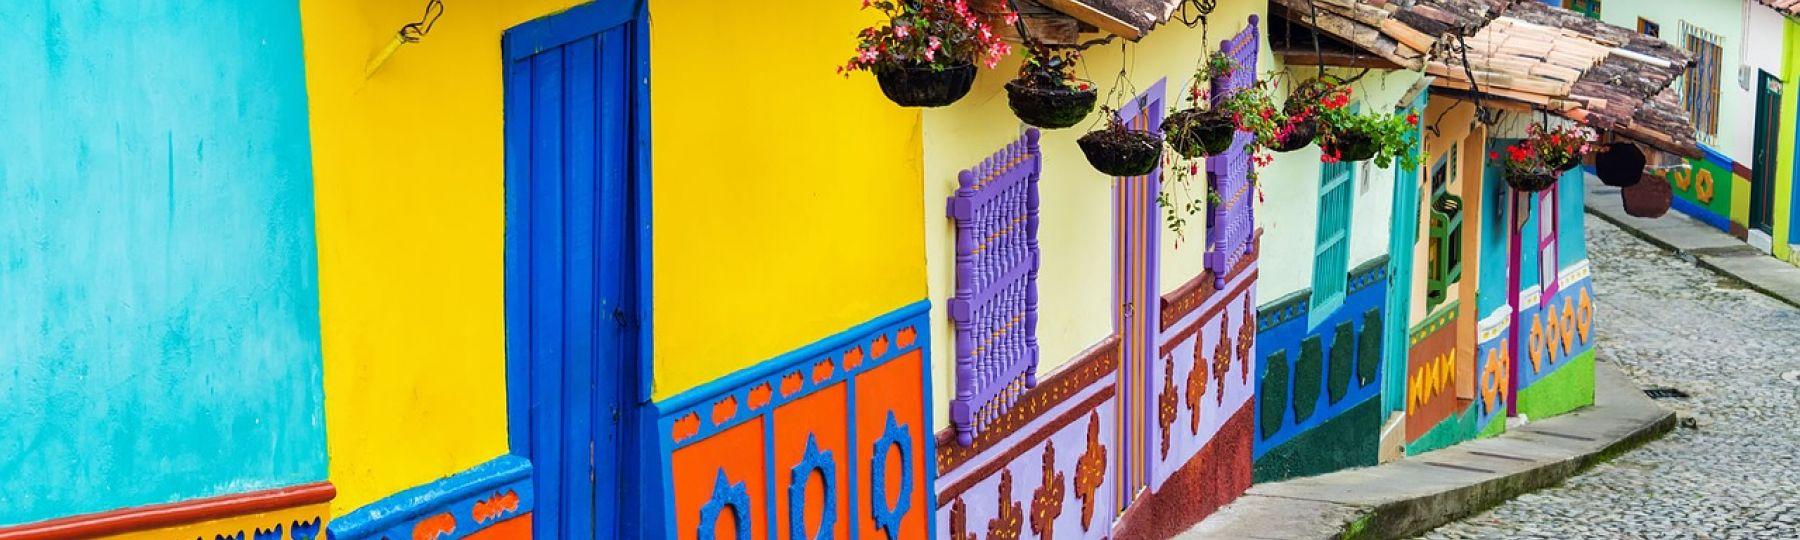 colombia-2434911_1280.jpg